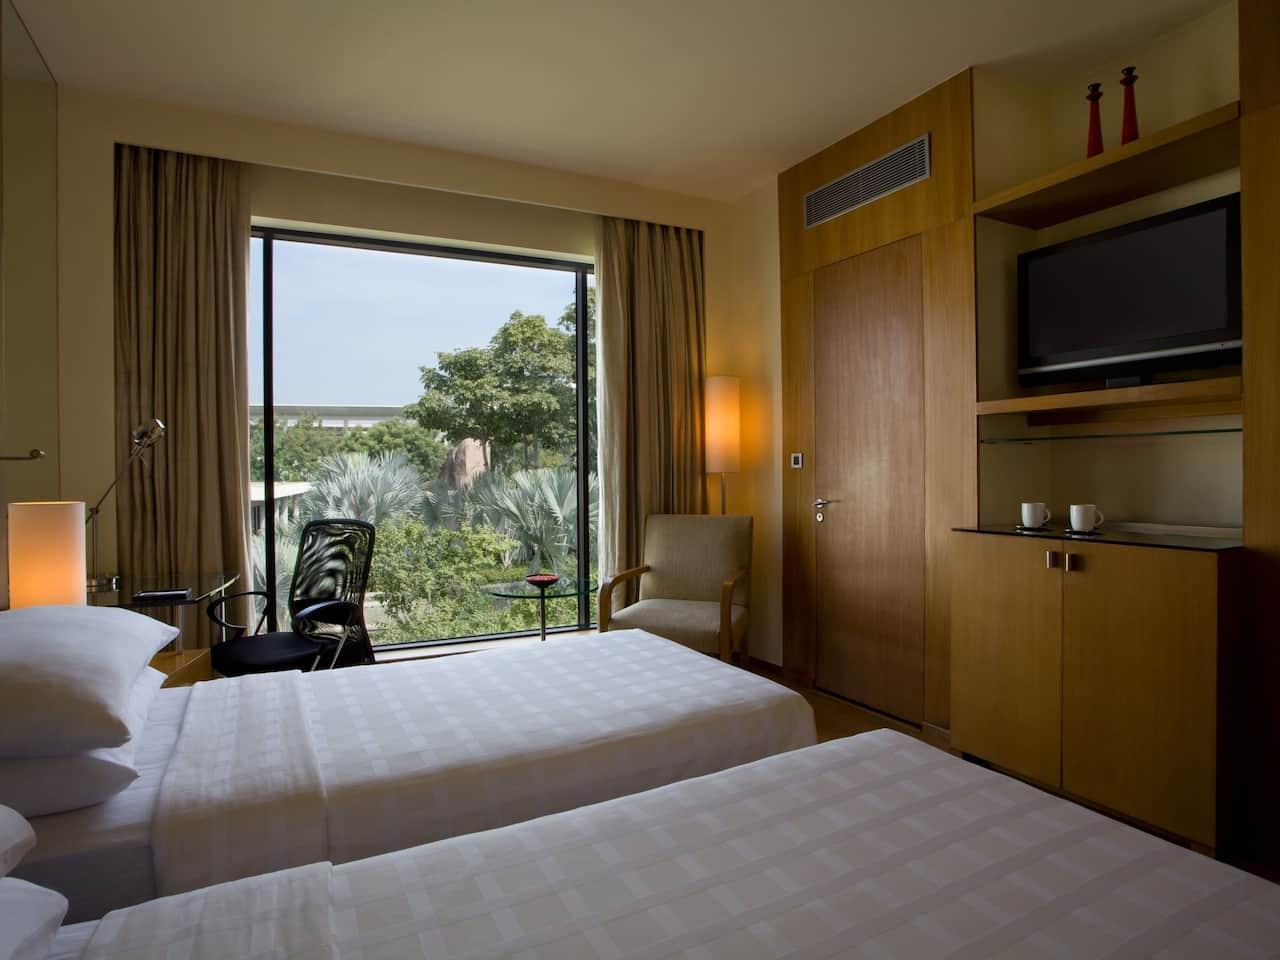 Bathroom of Room with Balcony at Hyatt Gachibowli